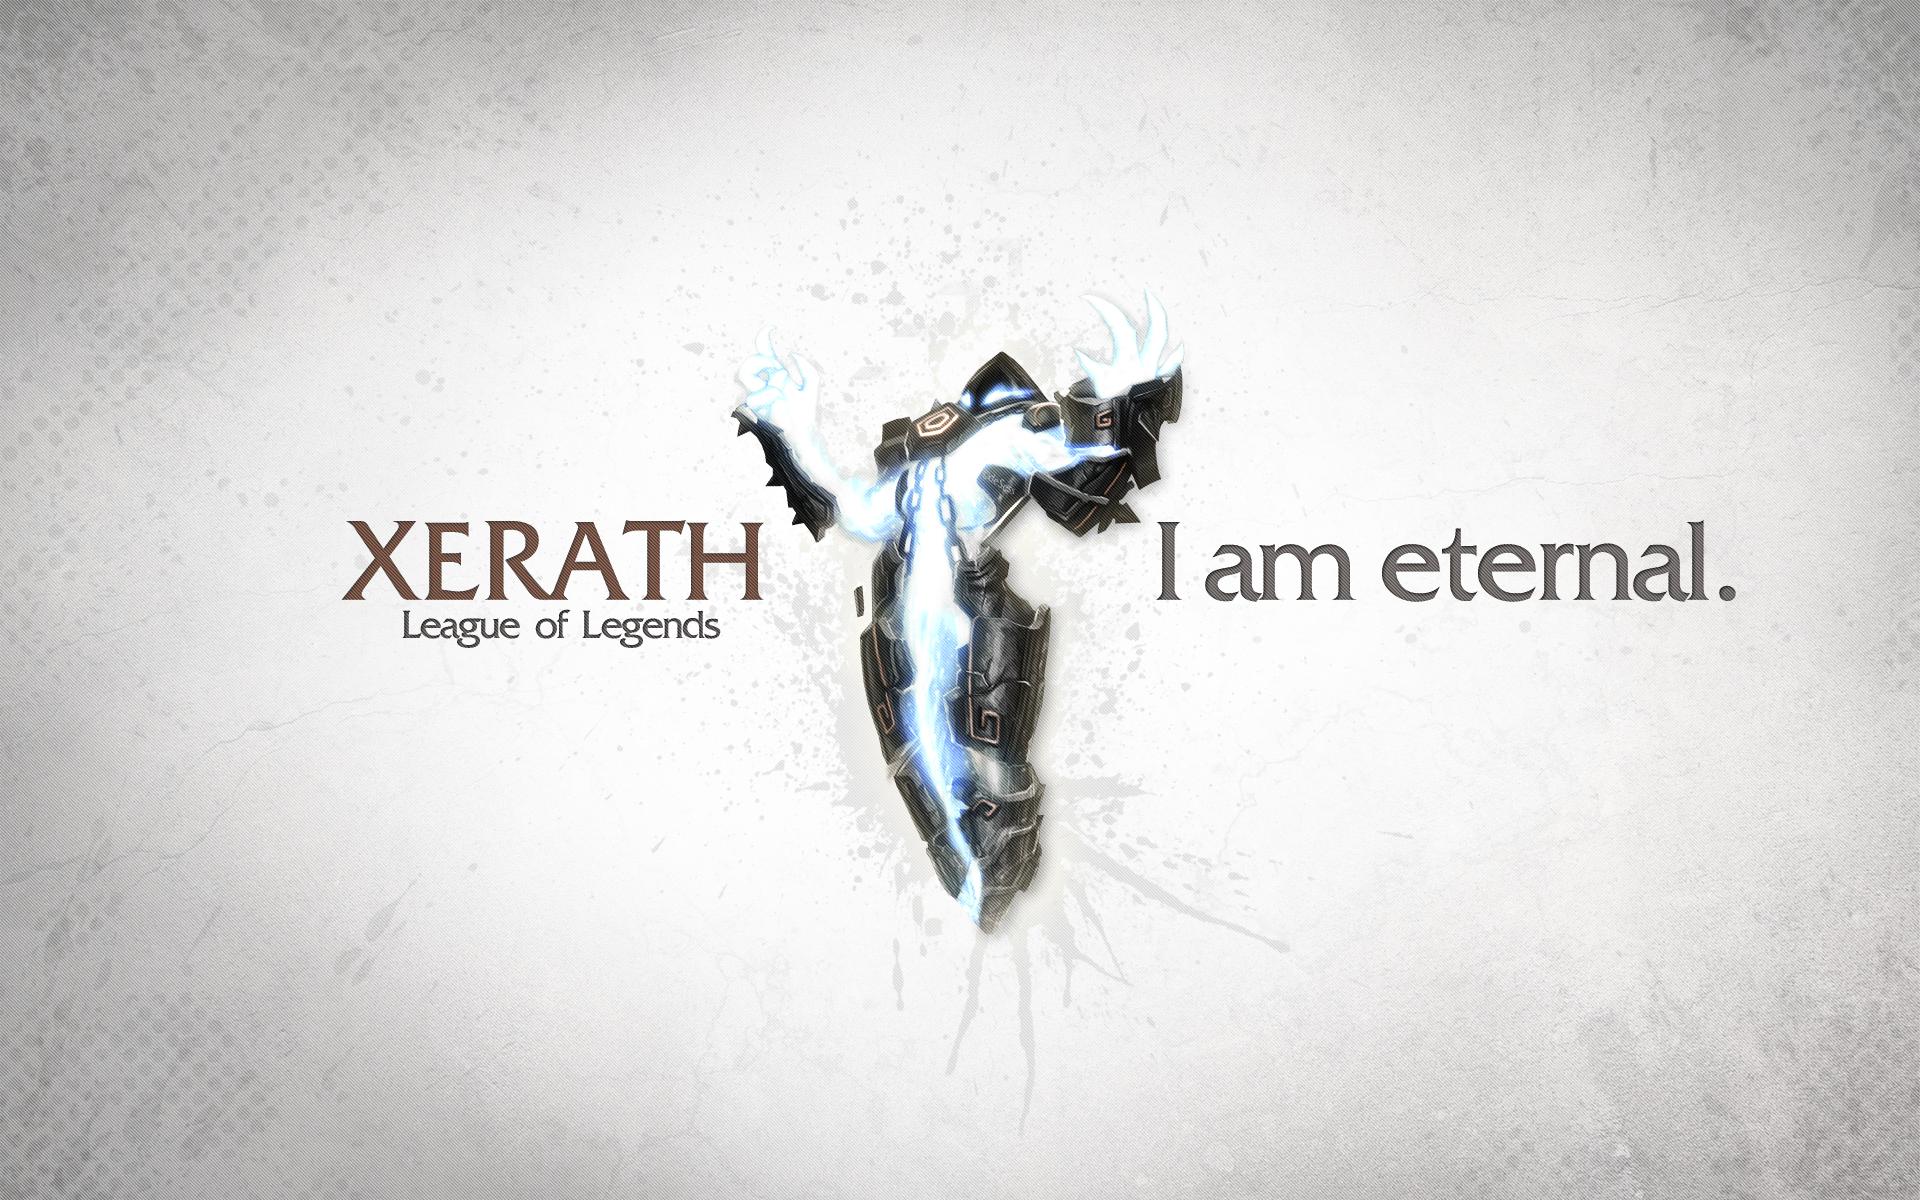 Xerath wallpaper